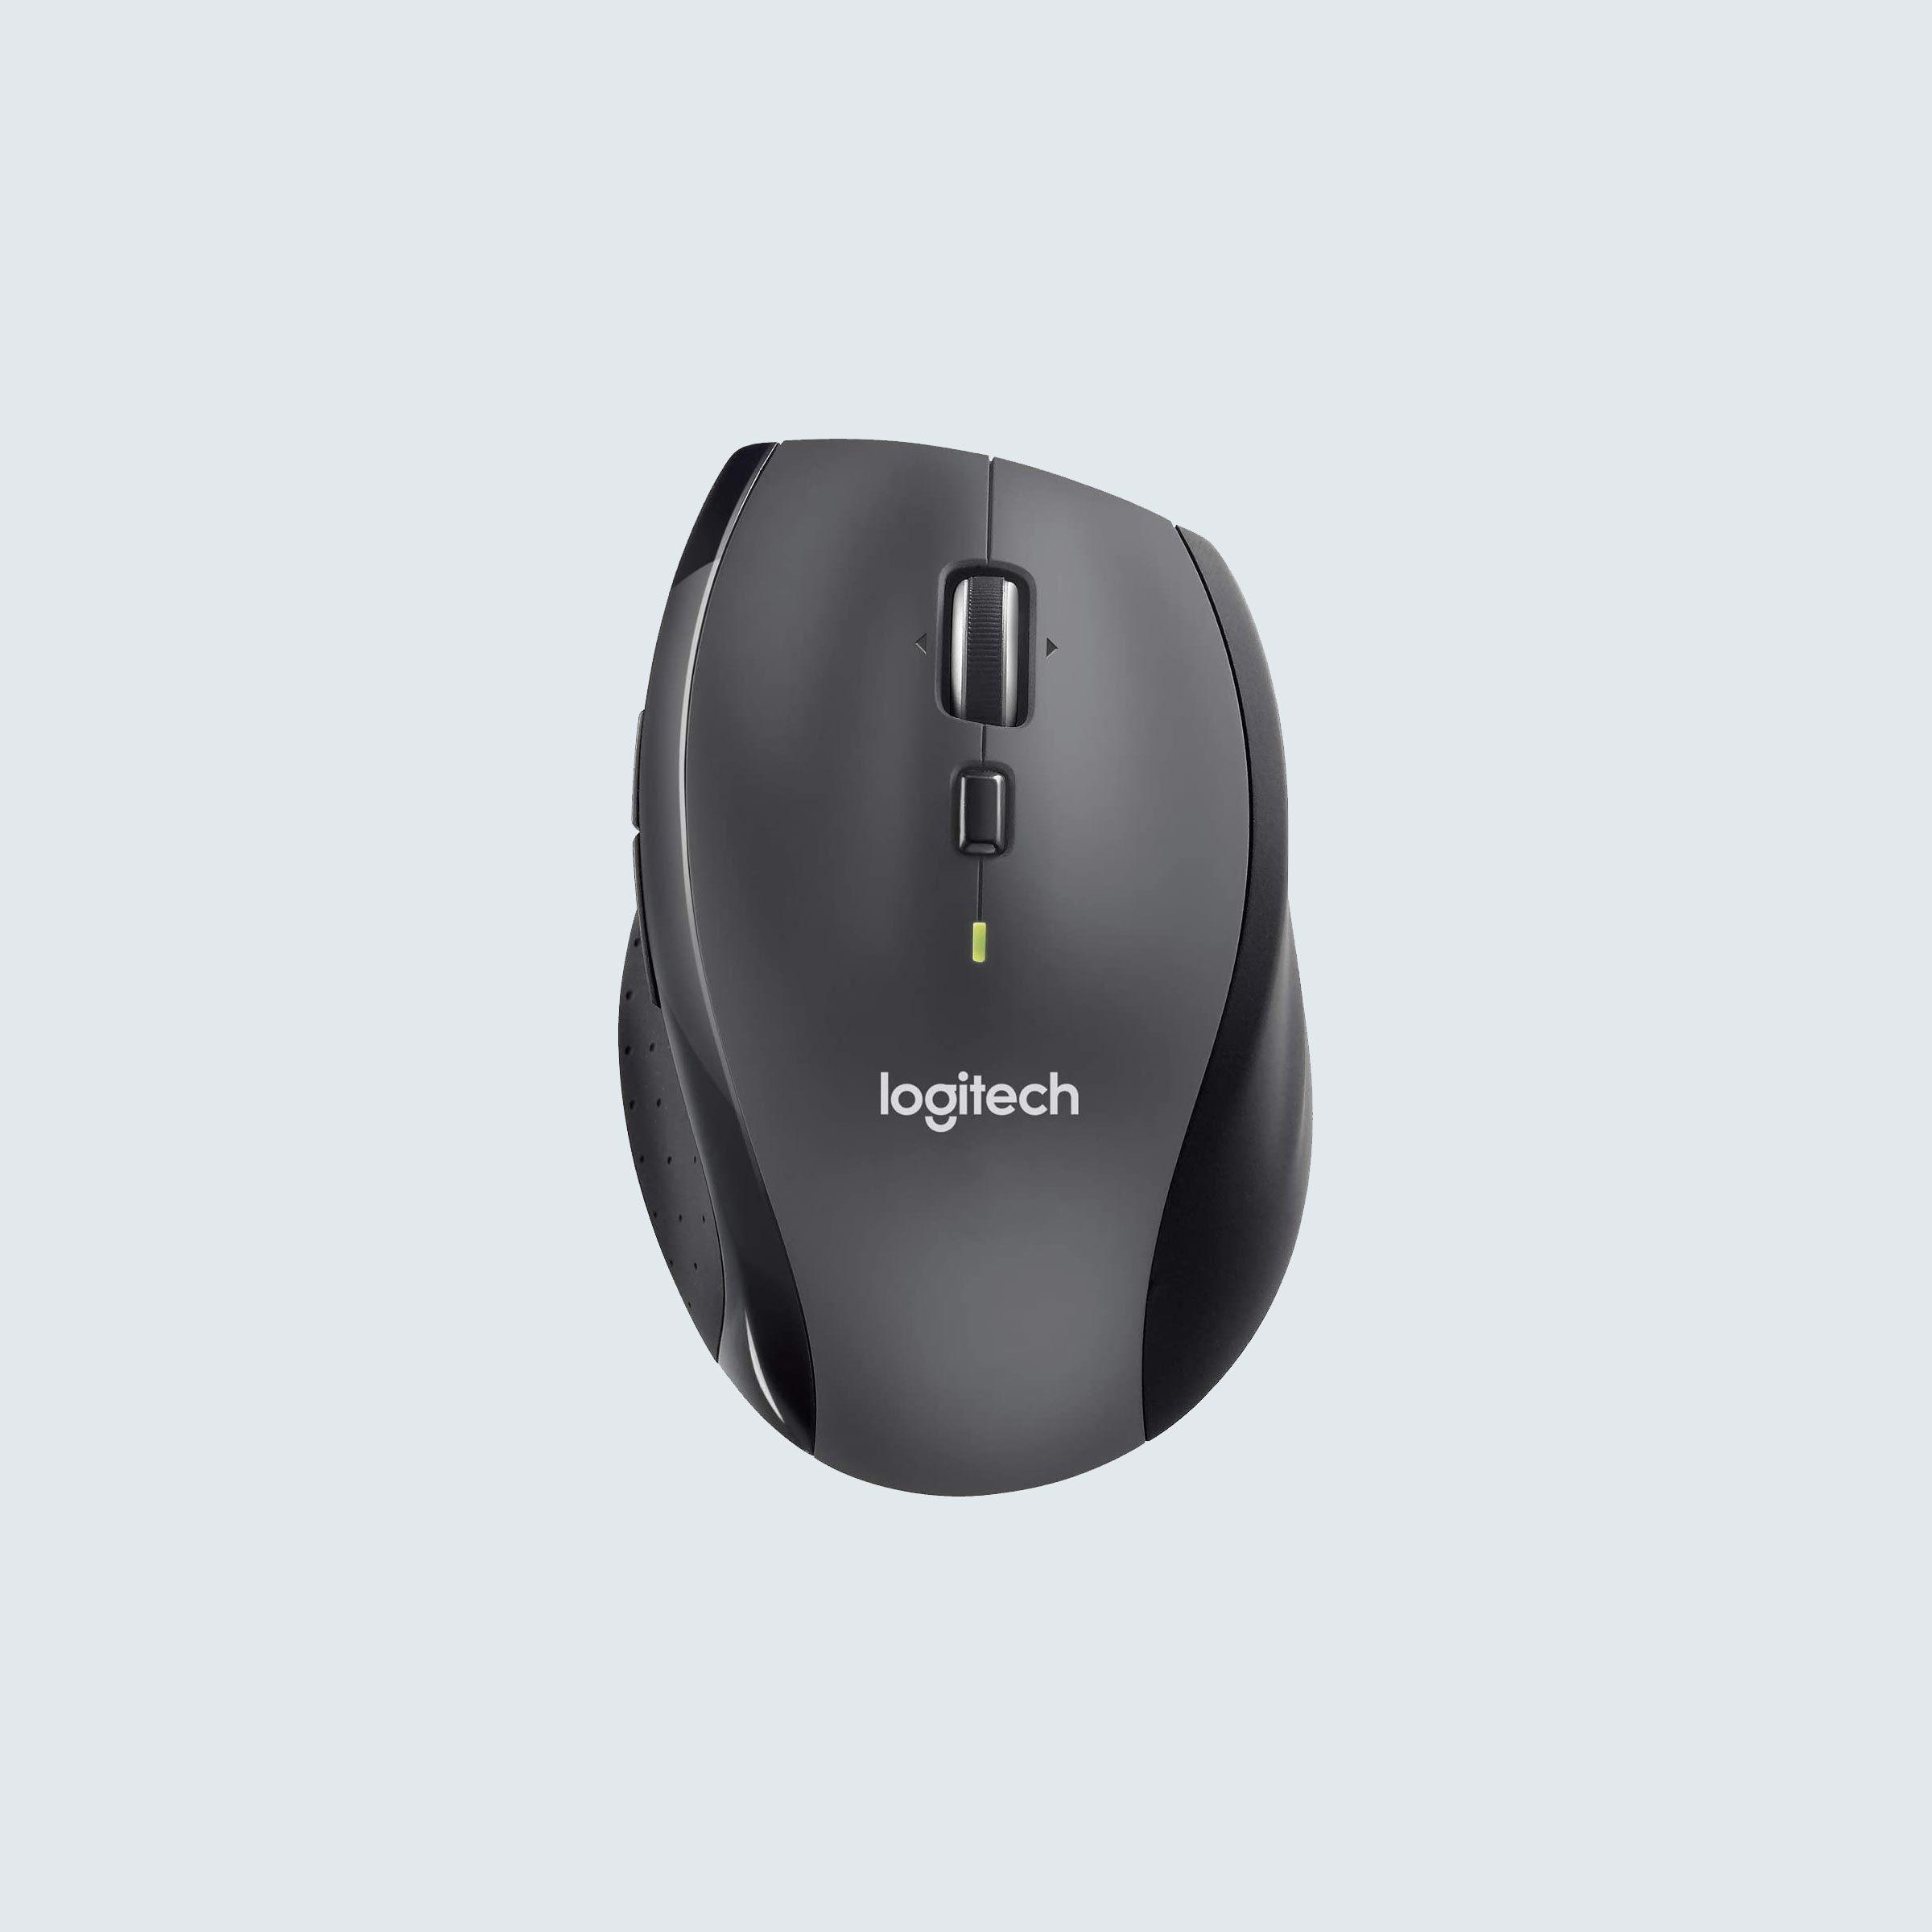 A good mouse